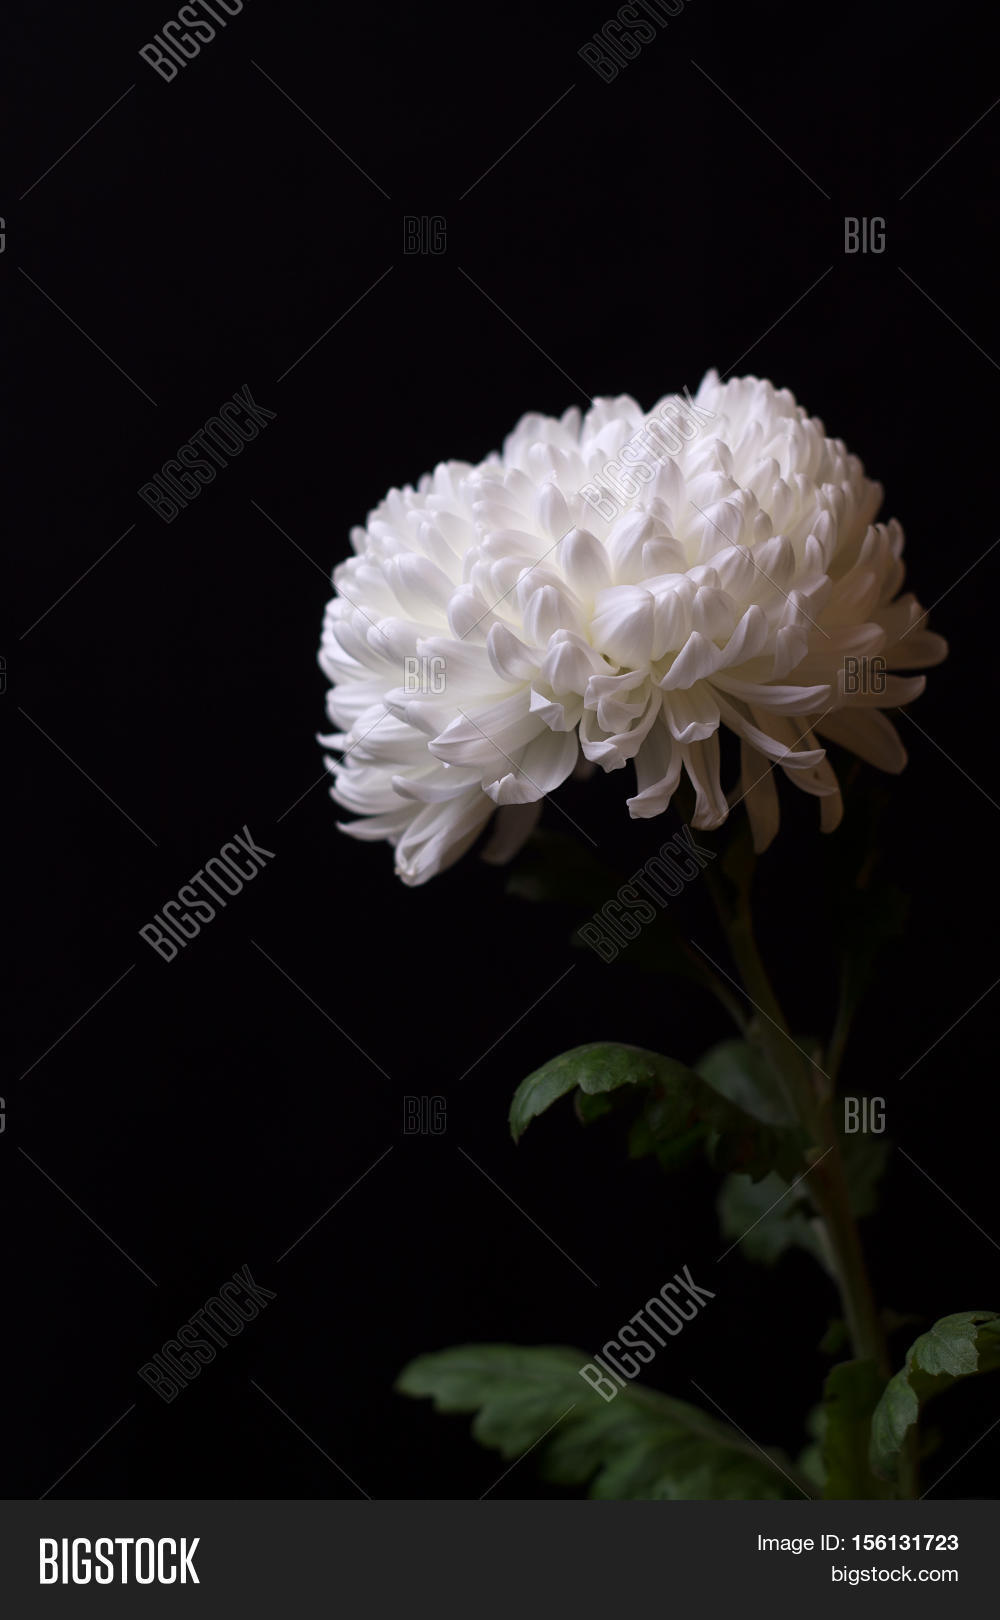 White Chrysanthemum On Image Photo Free Trial Bigstock